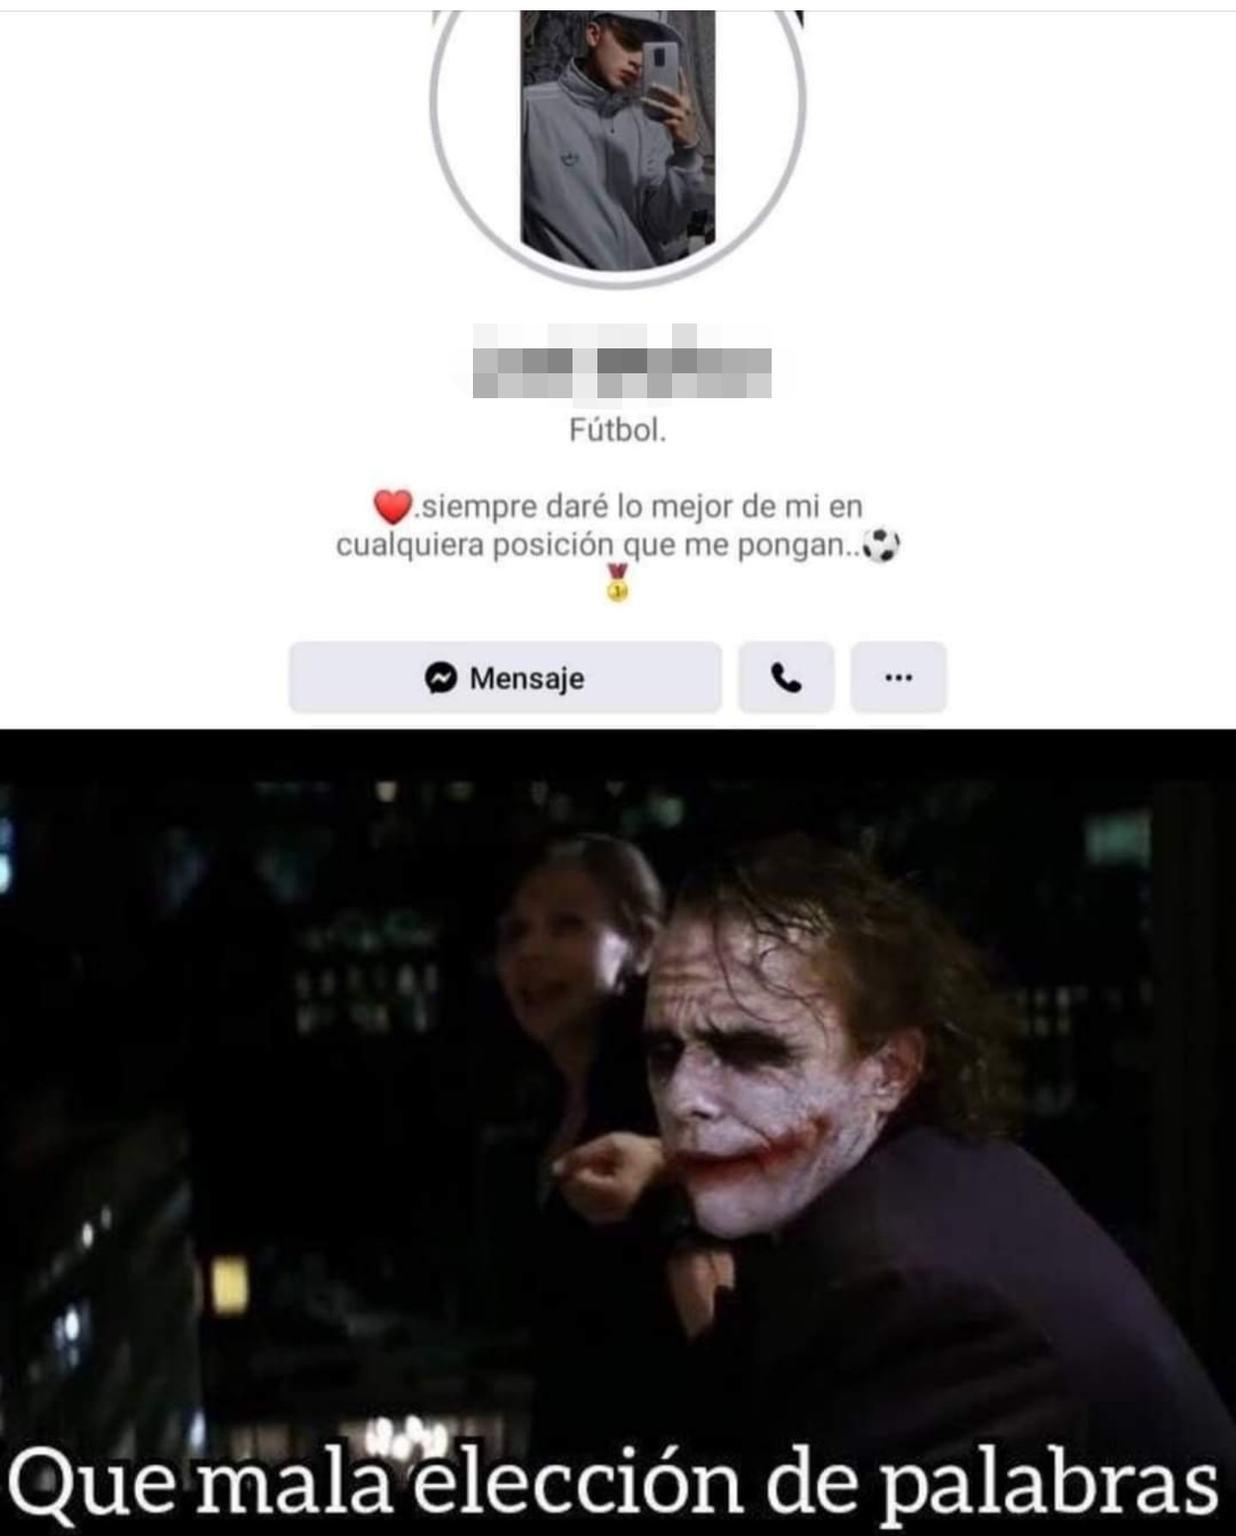 khe verga - meme